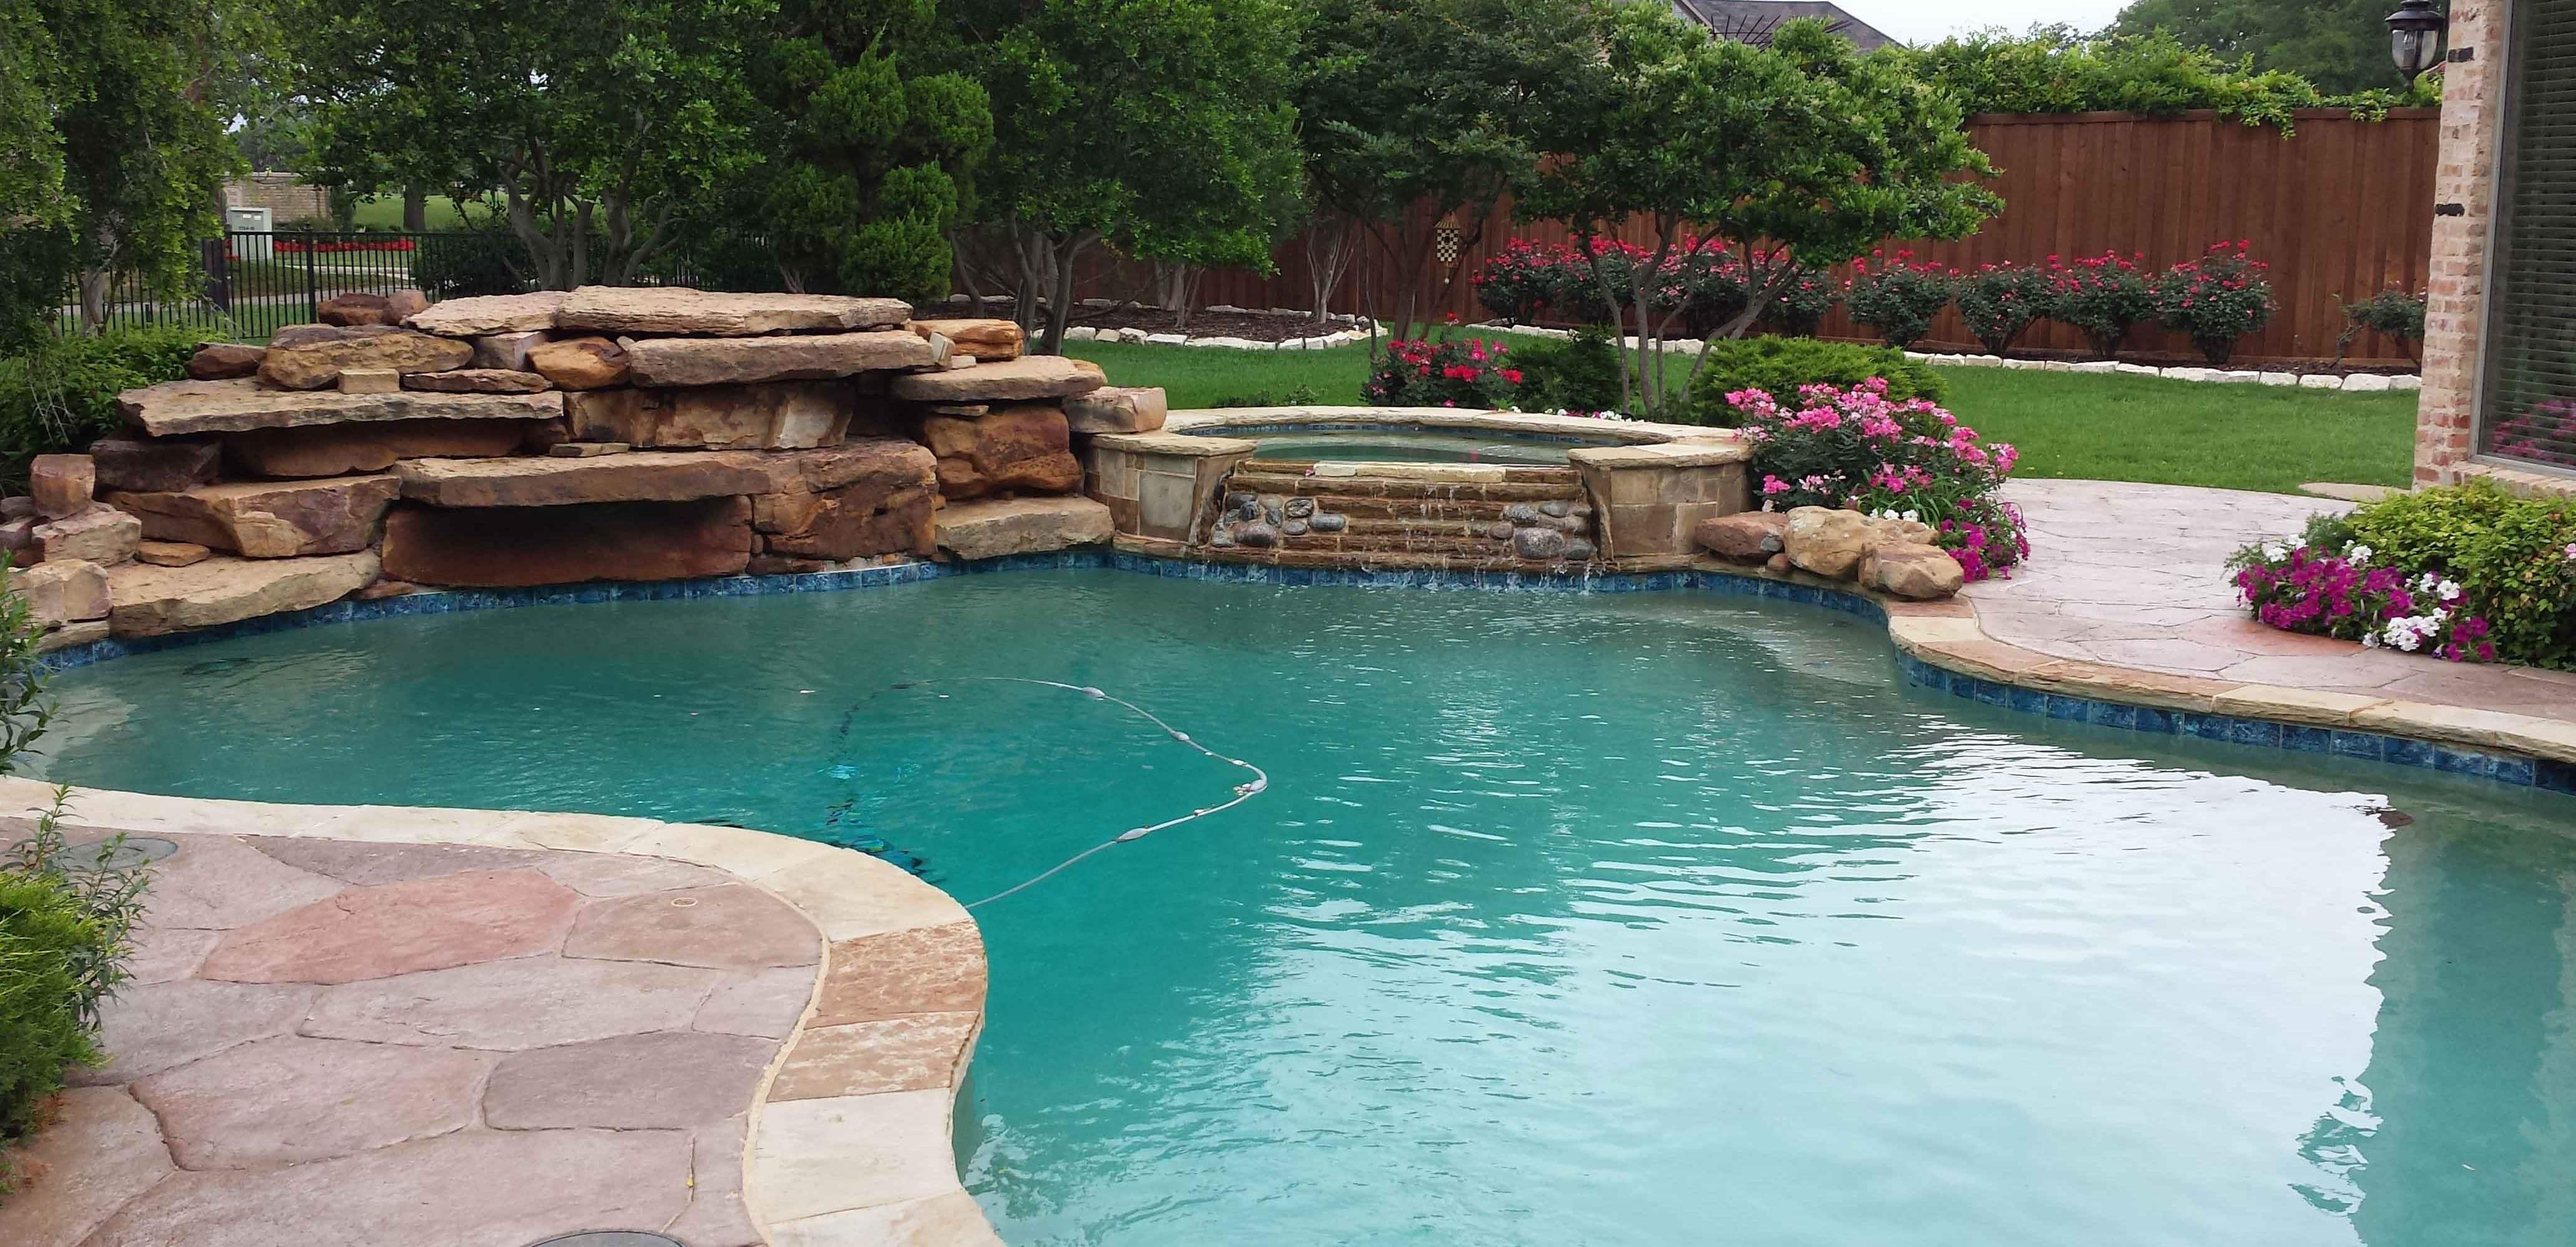 Texas Trophy Pools image 6